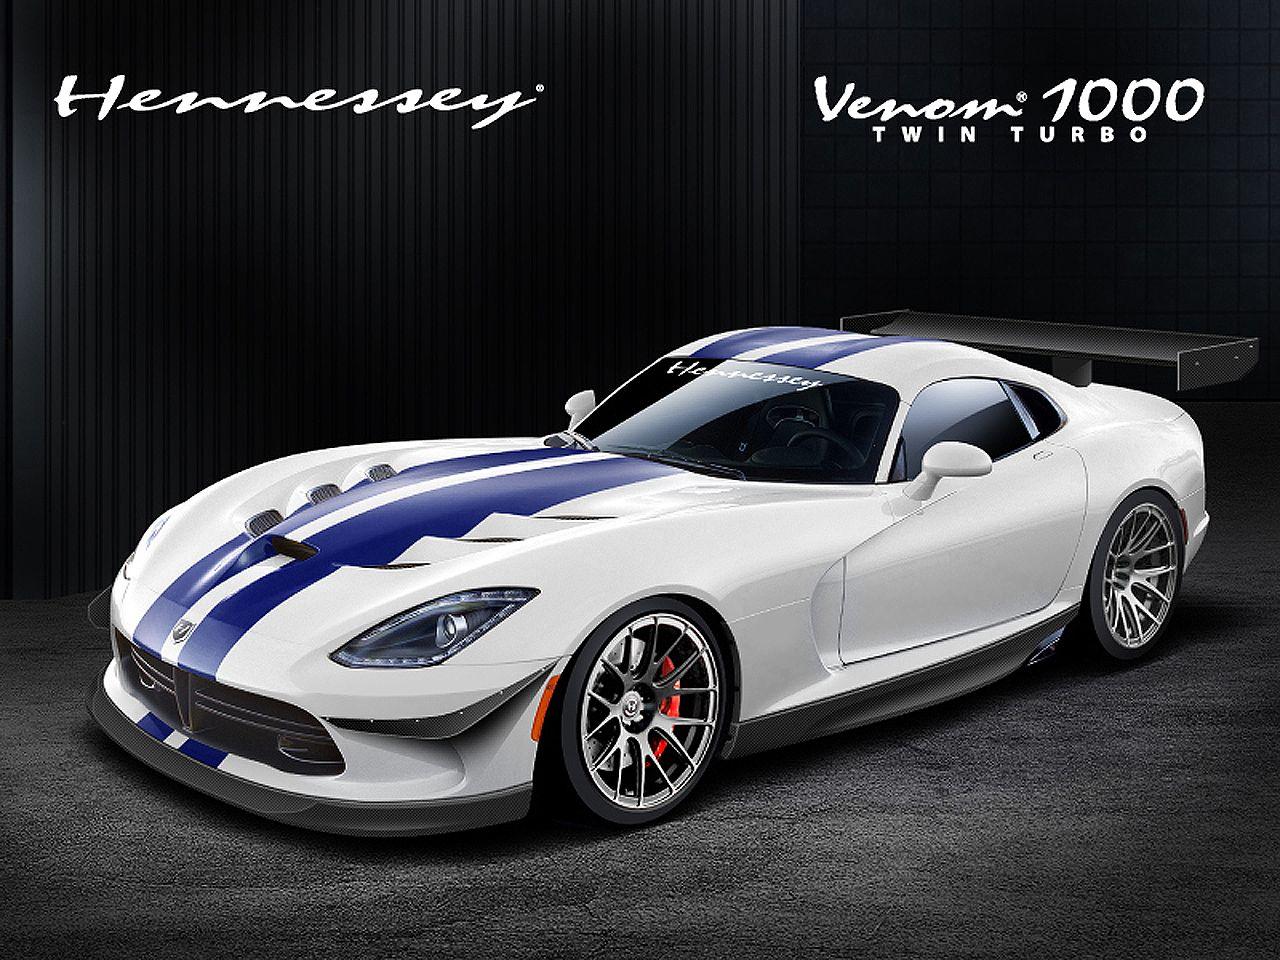 The beastly beast, Hennessey 2013 SRT Viper Venom with 1,120 horsepower